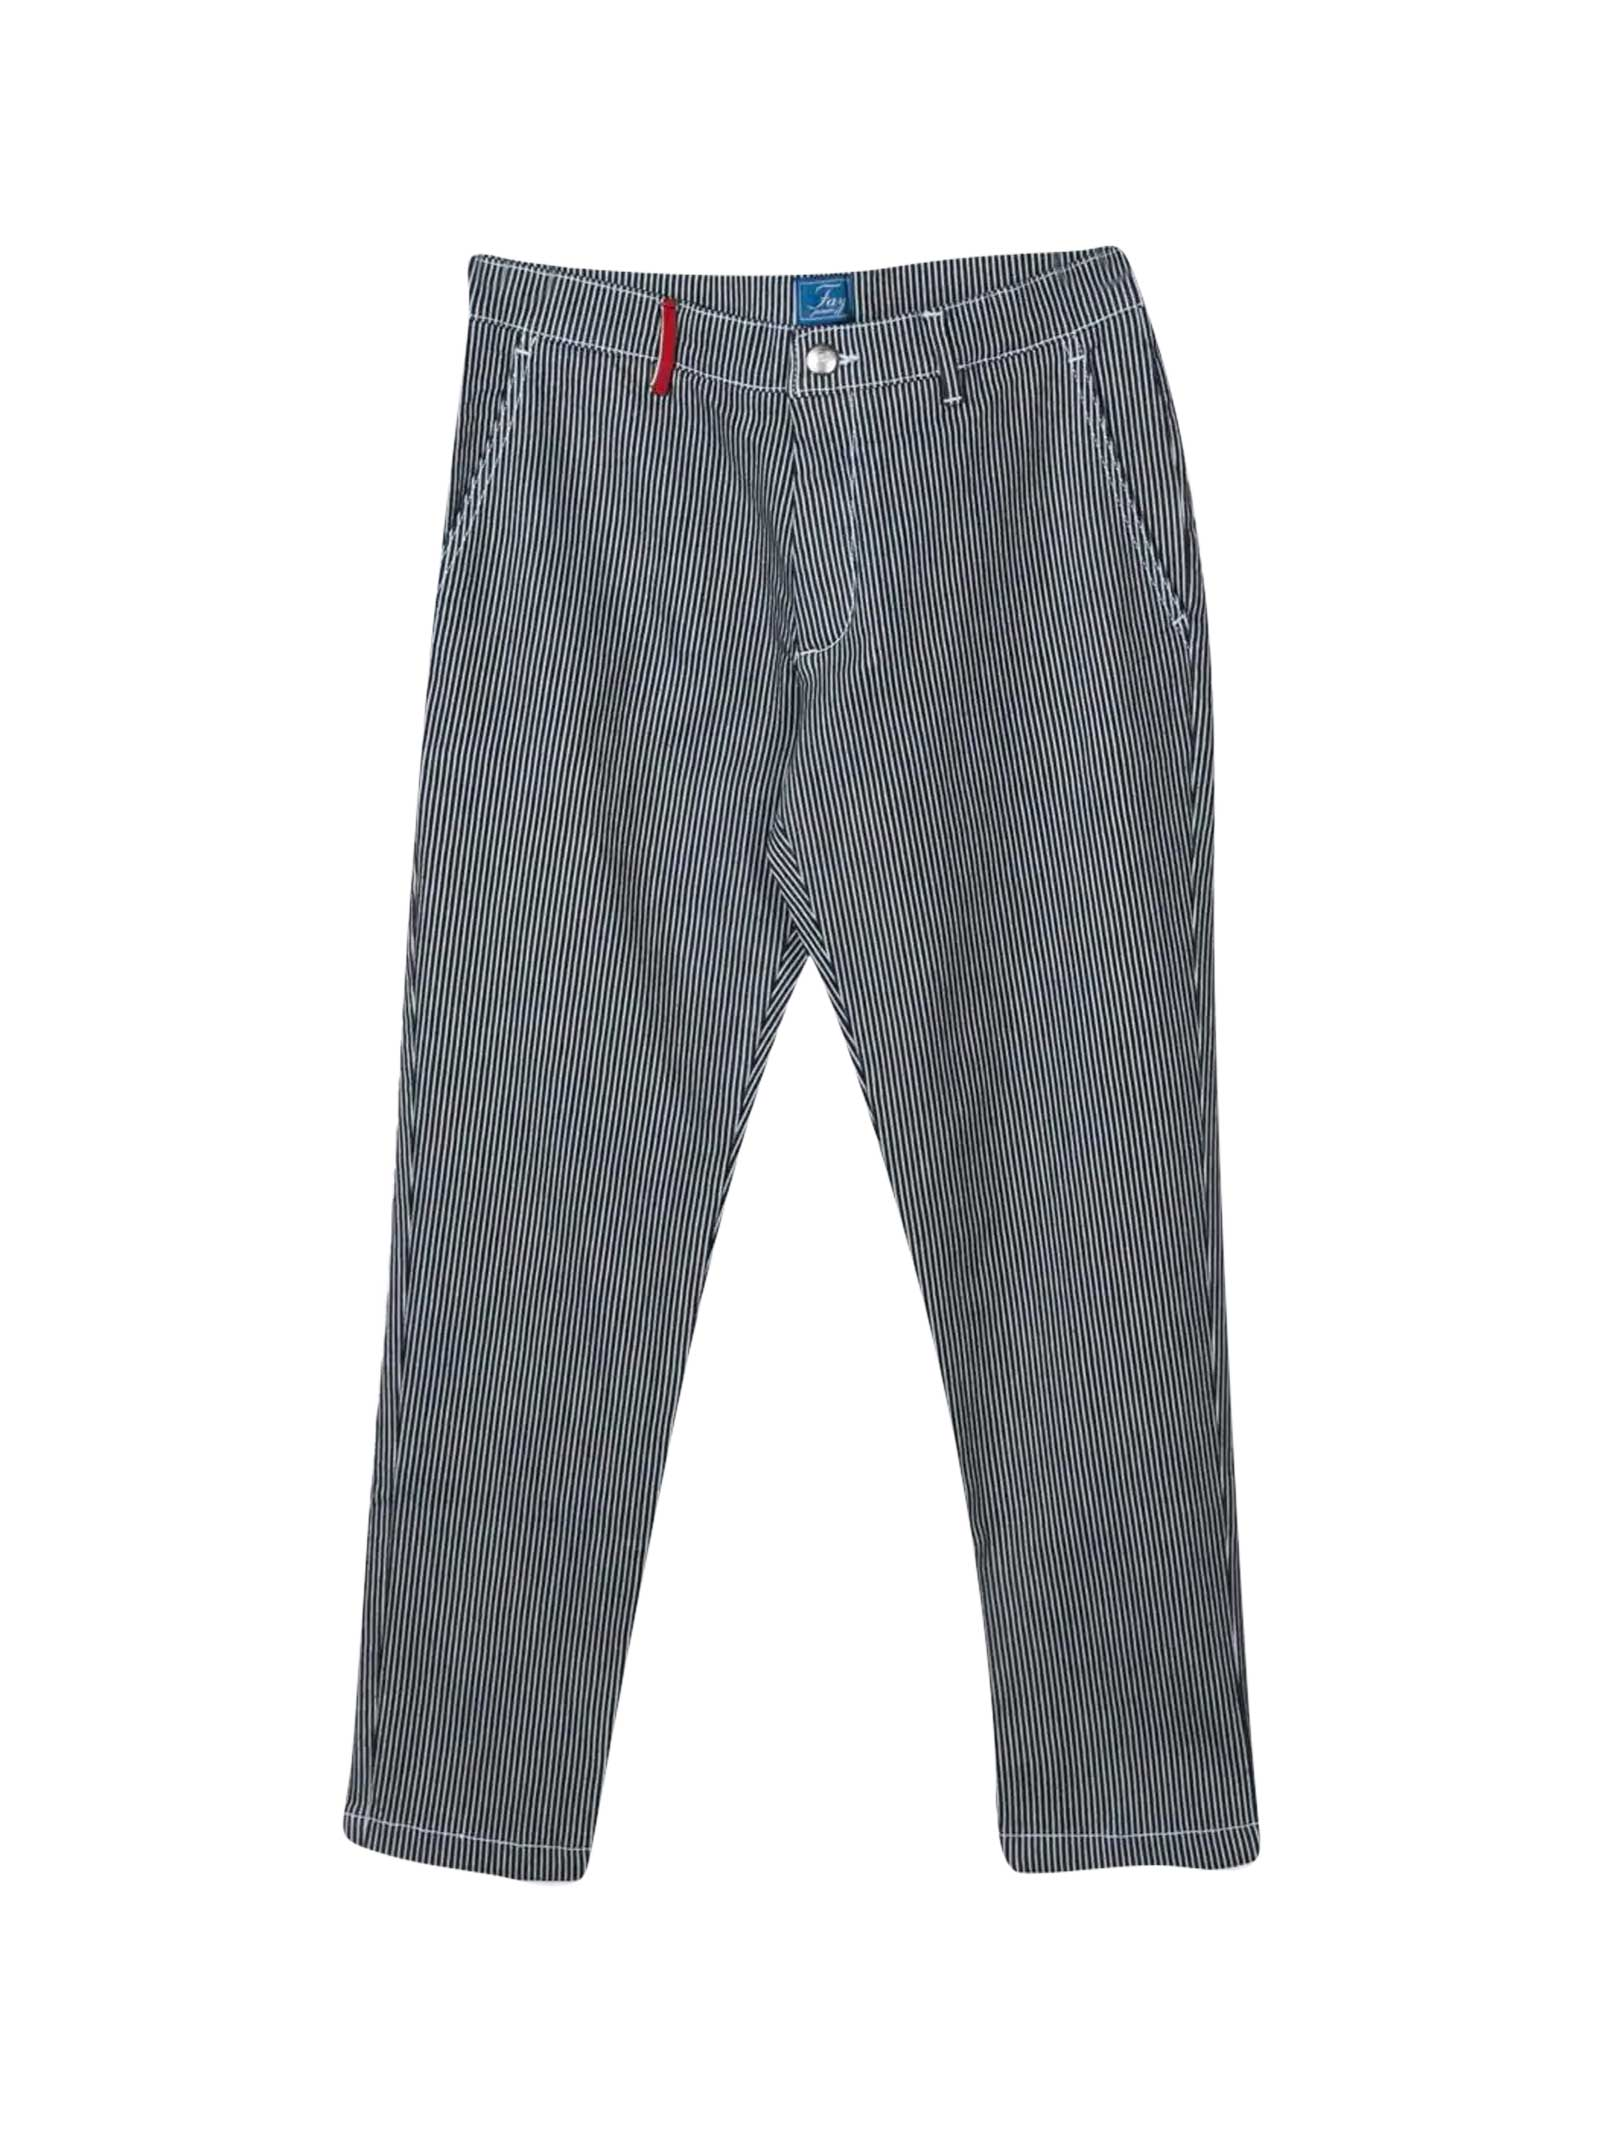 Fay Kids' Stripes Print Trousers In Blu/bianco